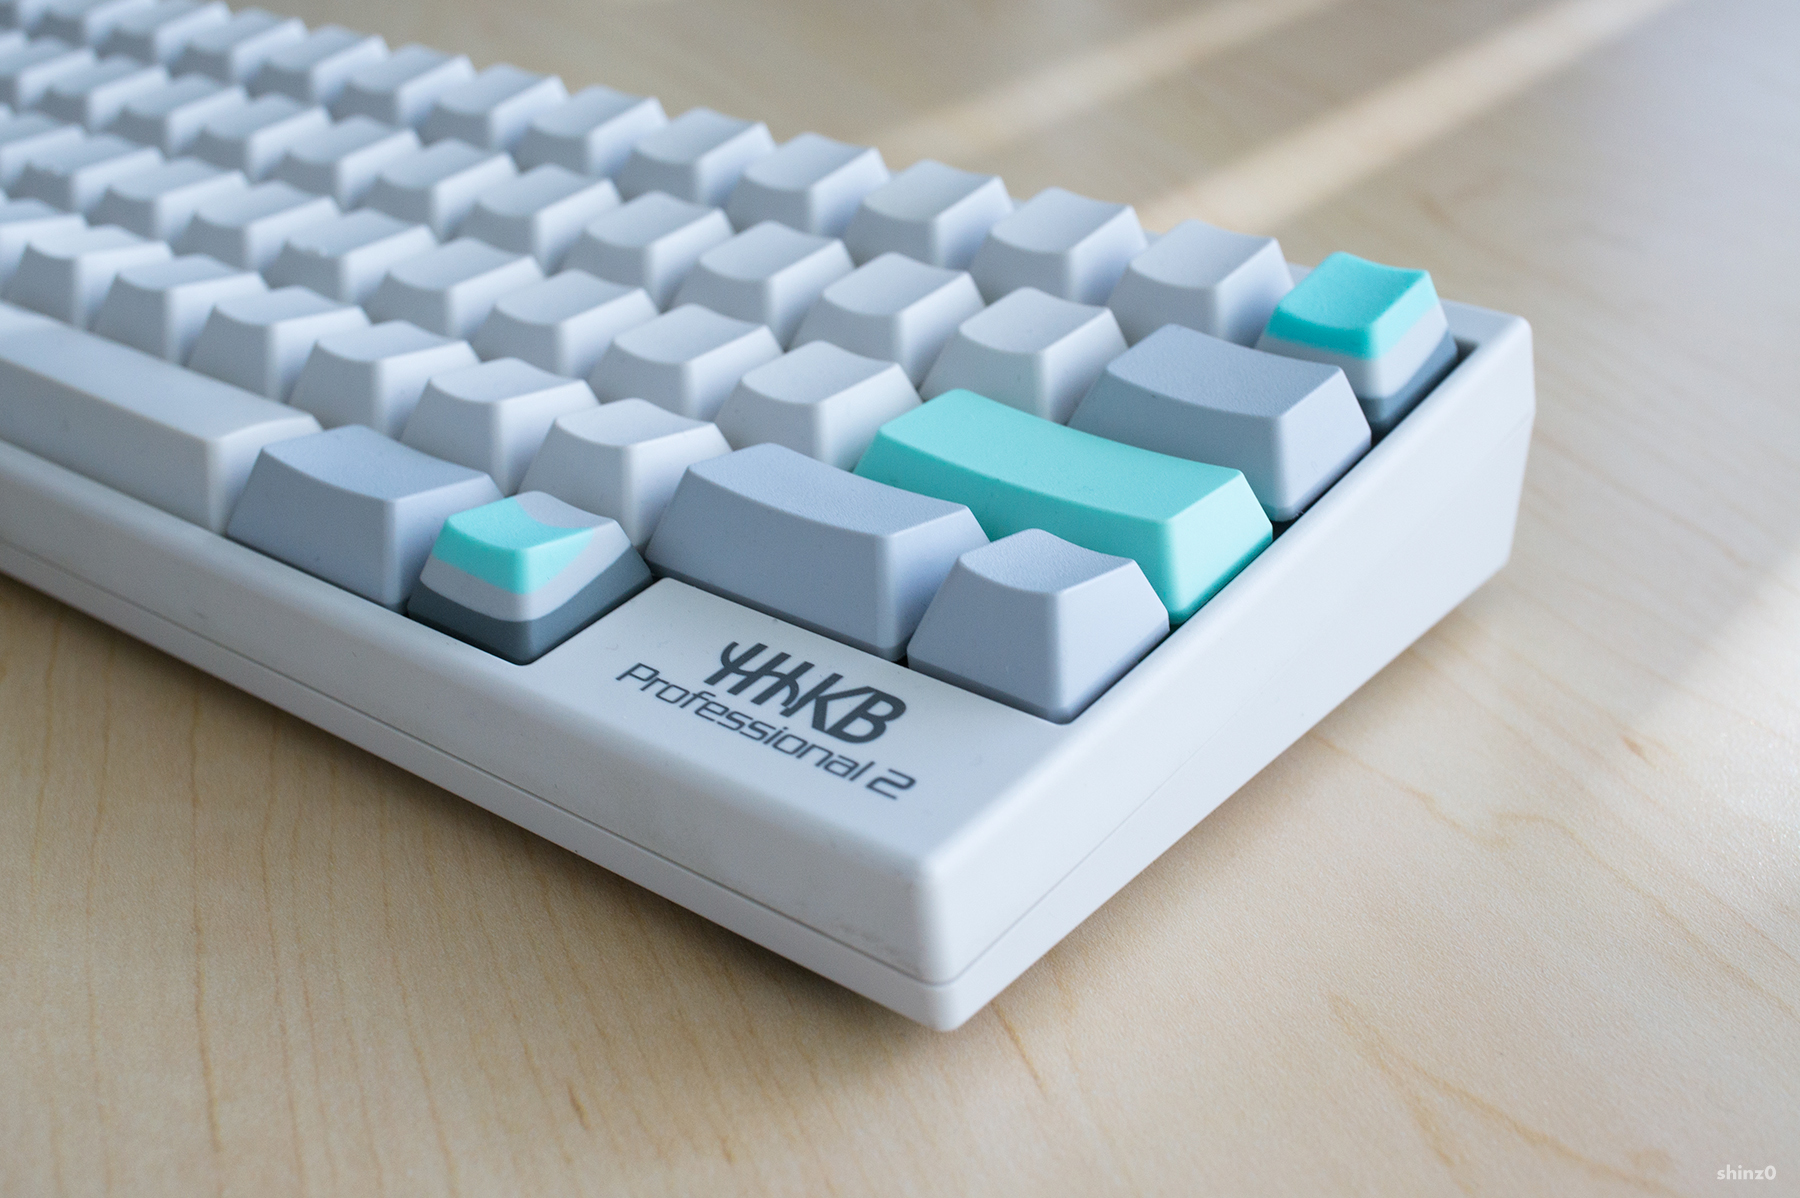 HHKB with HKP mods ( Photo by /u/shinz0 )